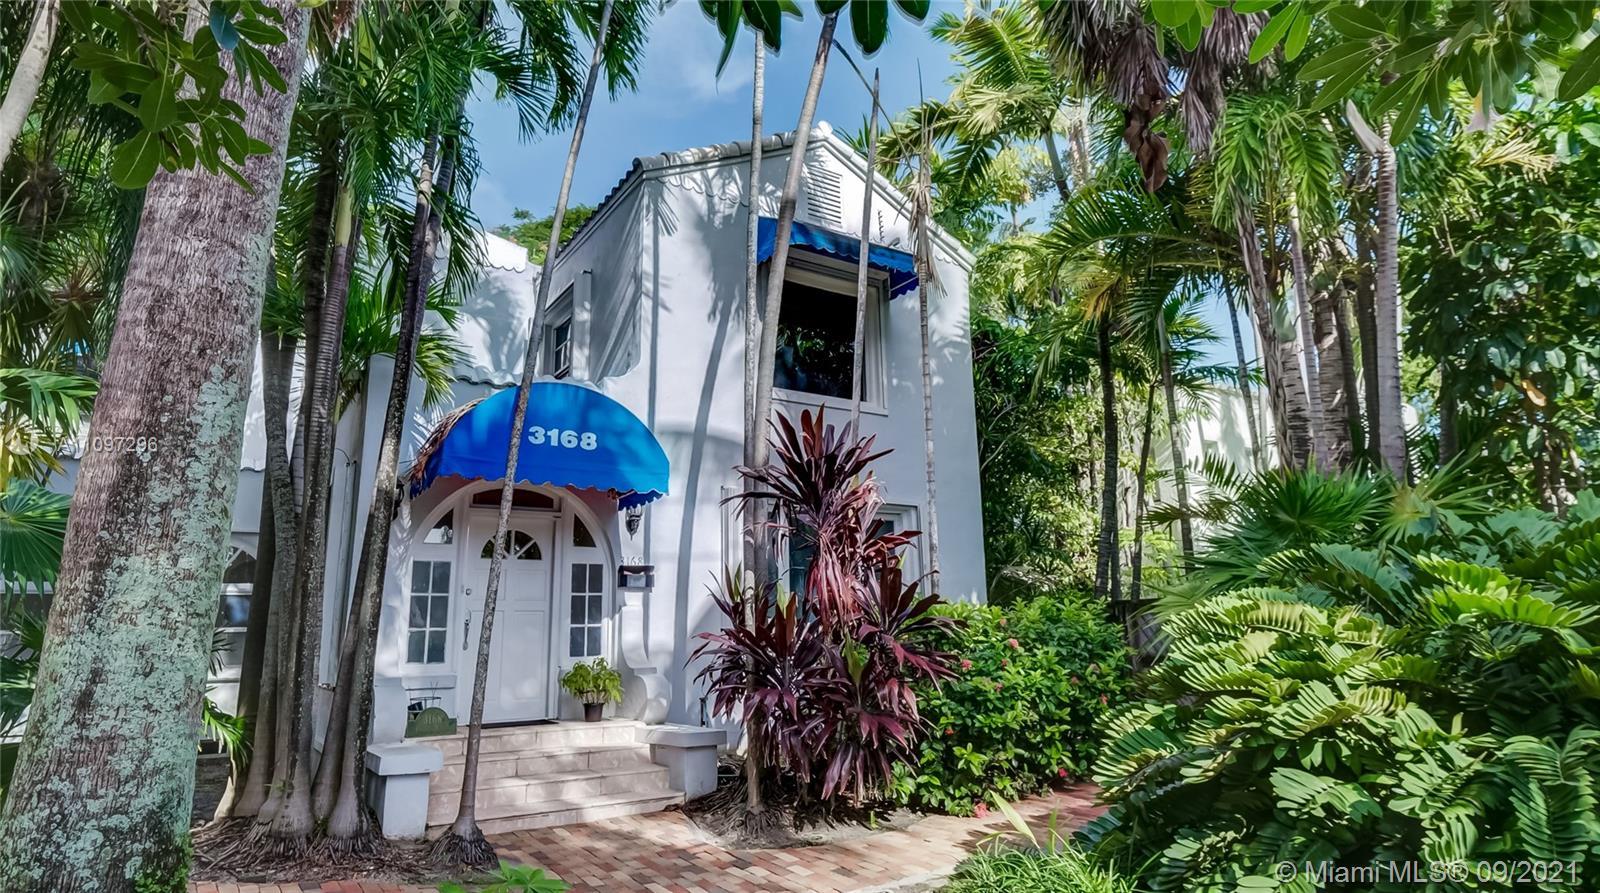 3168 Prairie Ave, Miami Beach, Florida 33140